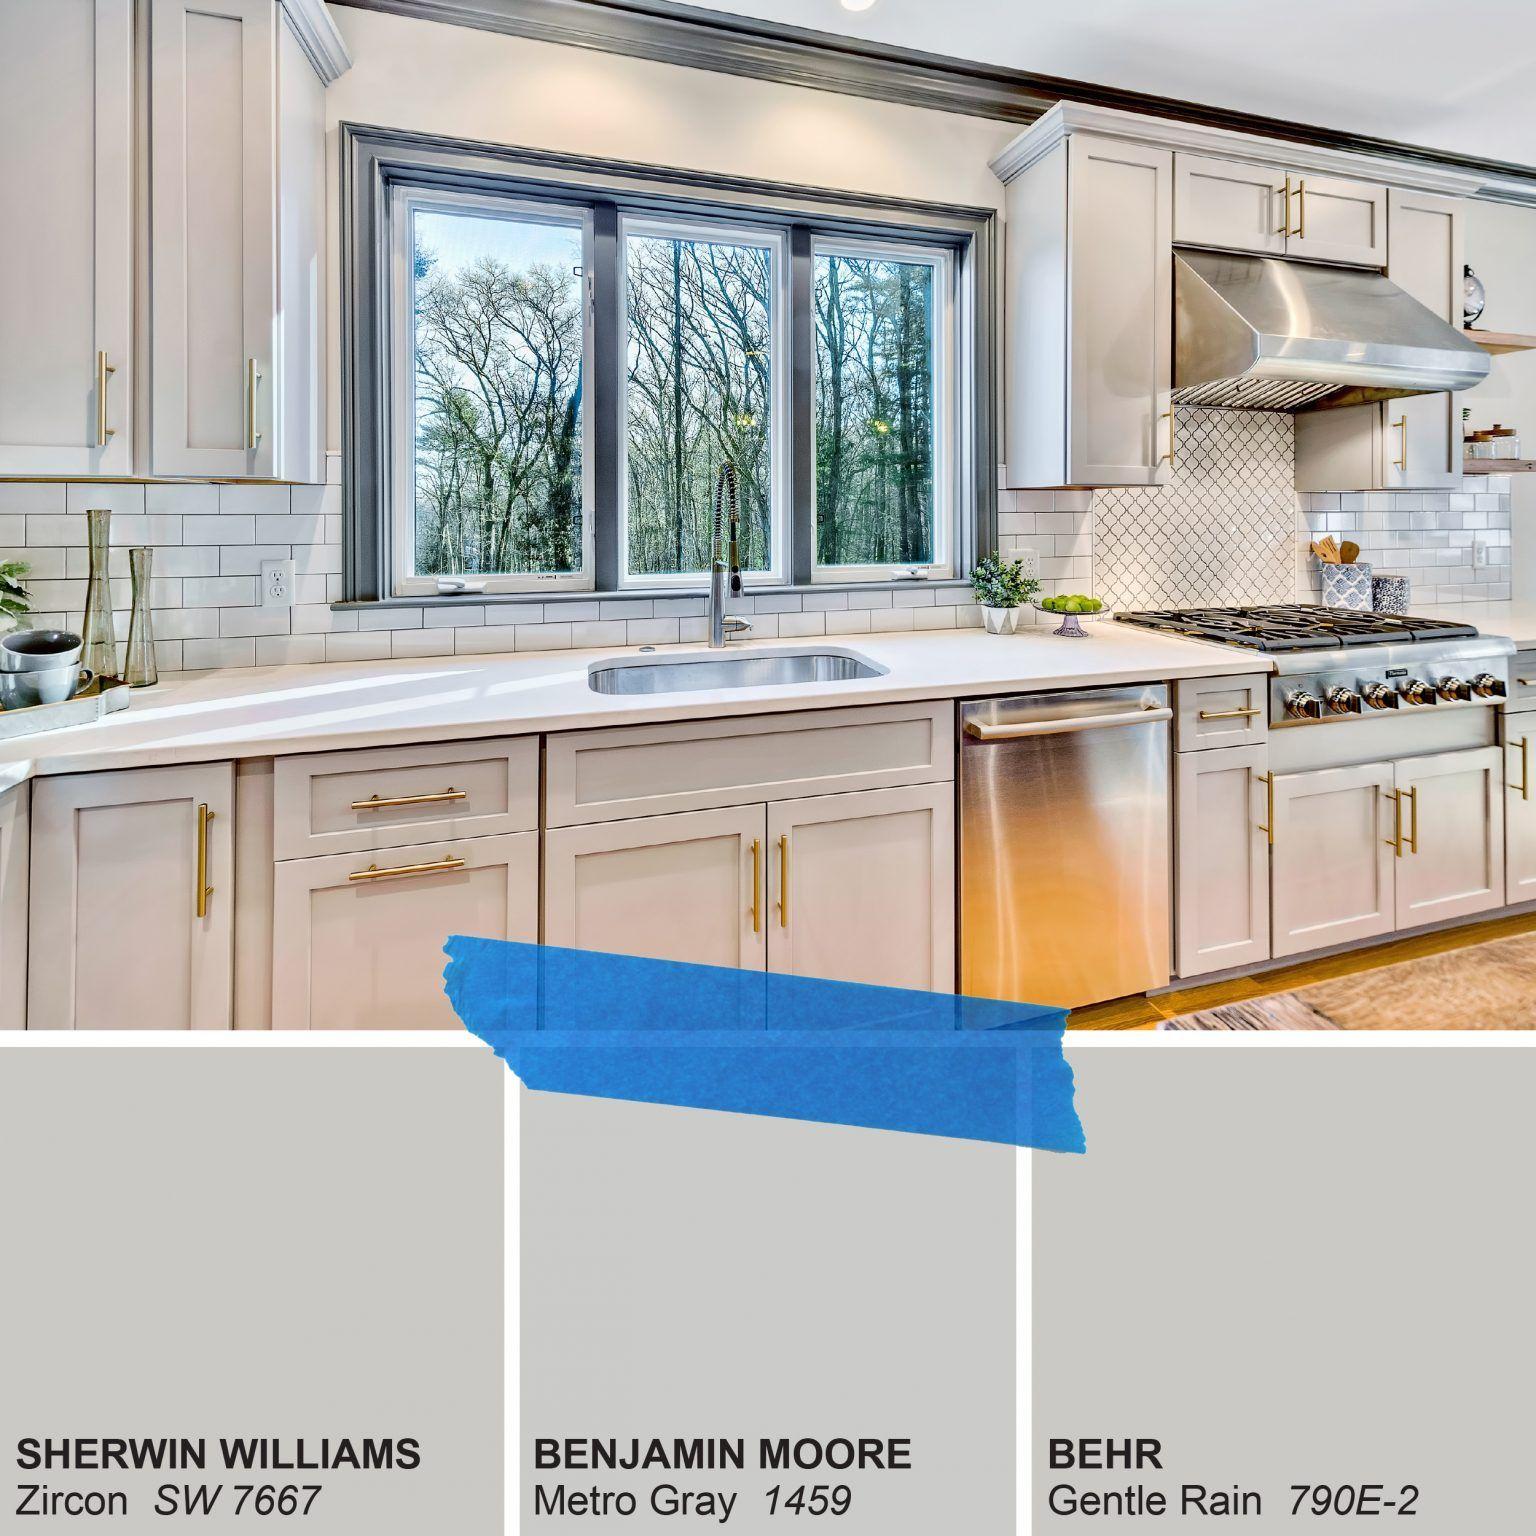 Kadilak Homes Blog Real Estate Home Renovation Burlington Ma In 2020 Green Kitchen Designs White Kitchen Design Kitchen Cabinet Remodel